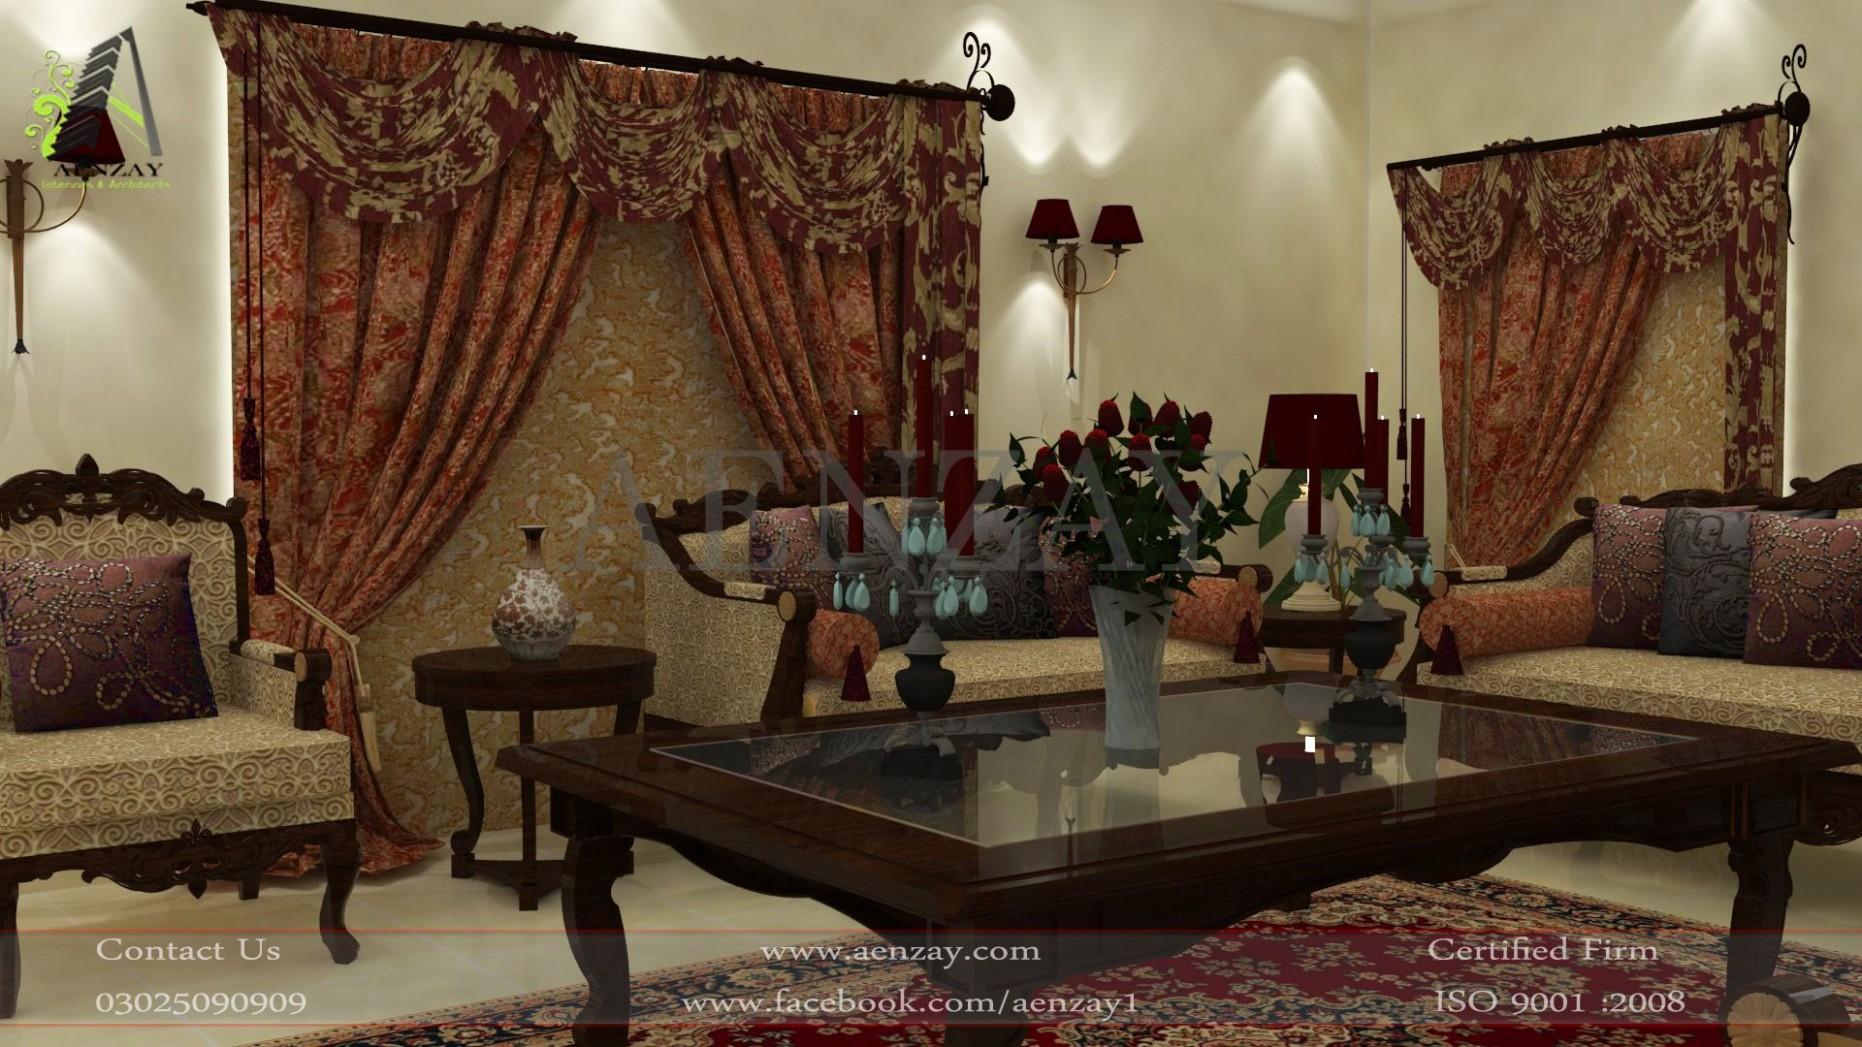 living room ideas pakistan  Furniture design living room, Living  - Dining Room Ideas In Pakistan